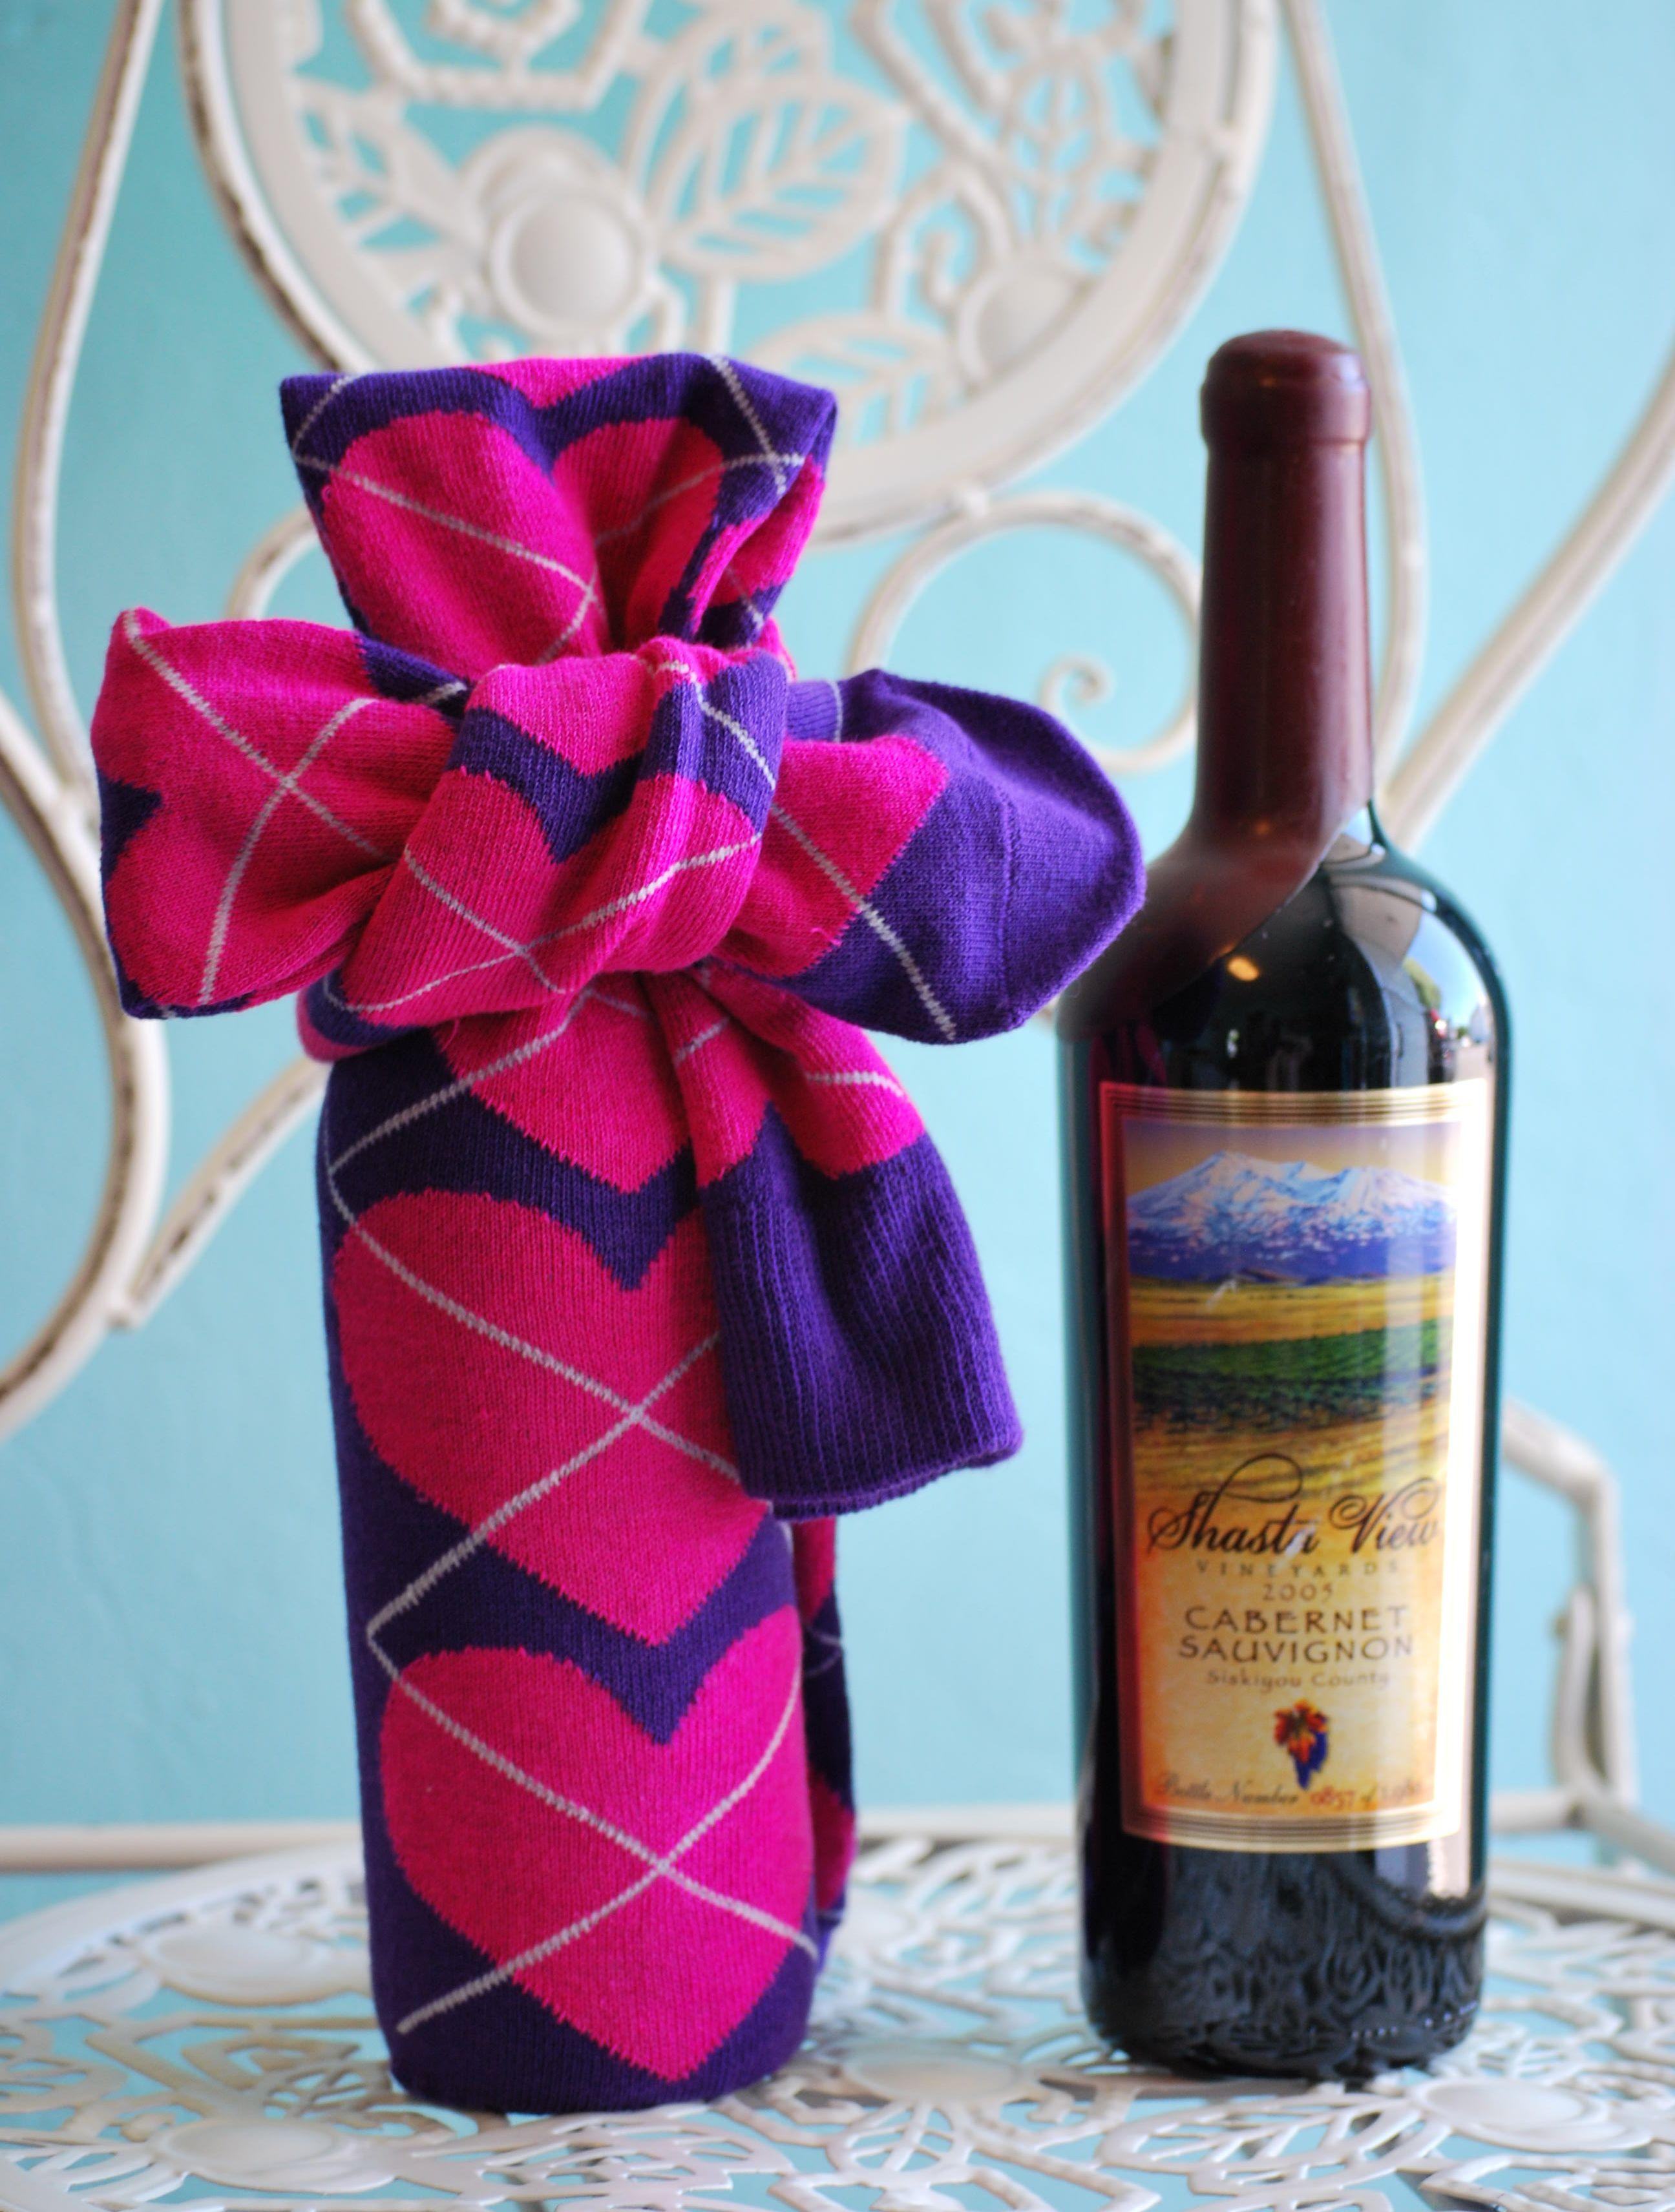 Super cute and easy DIY wine gift wrap idea 1. Pick a